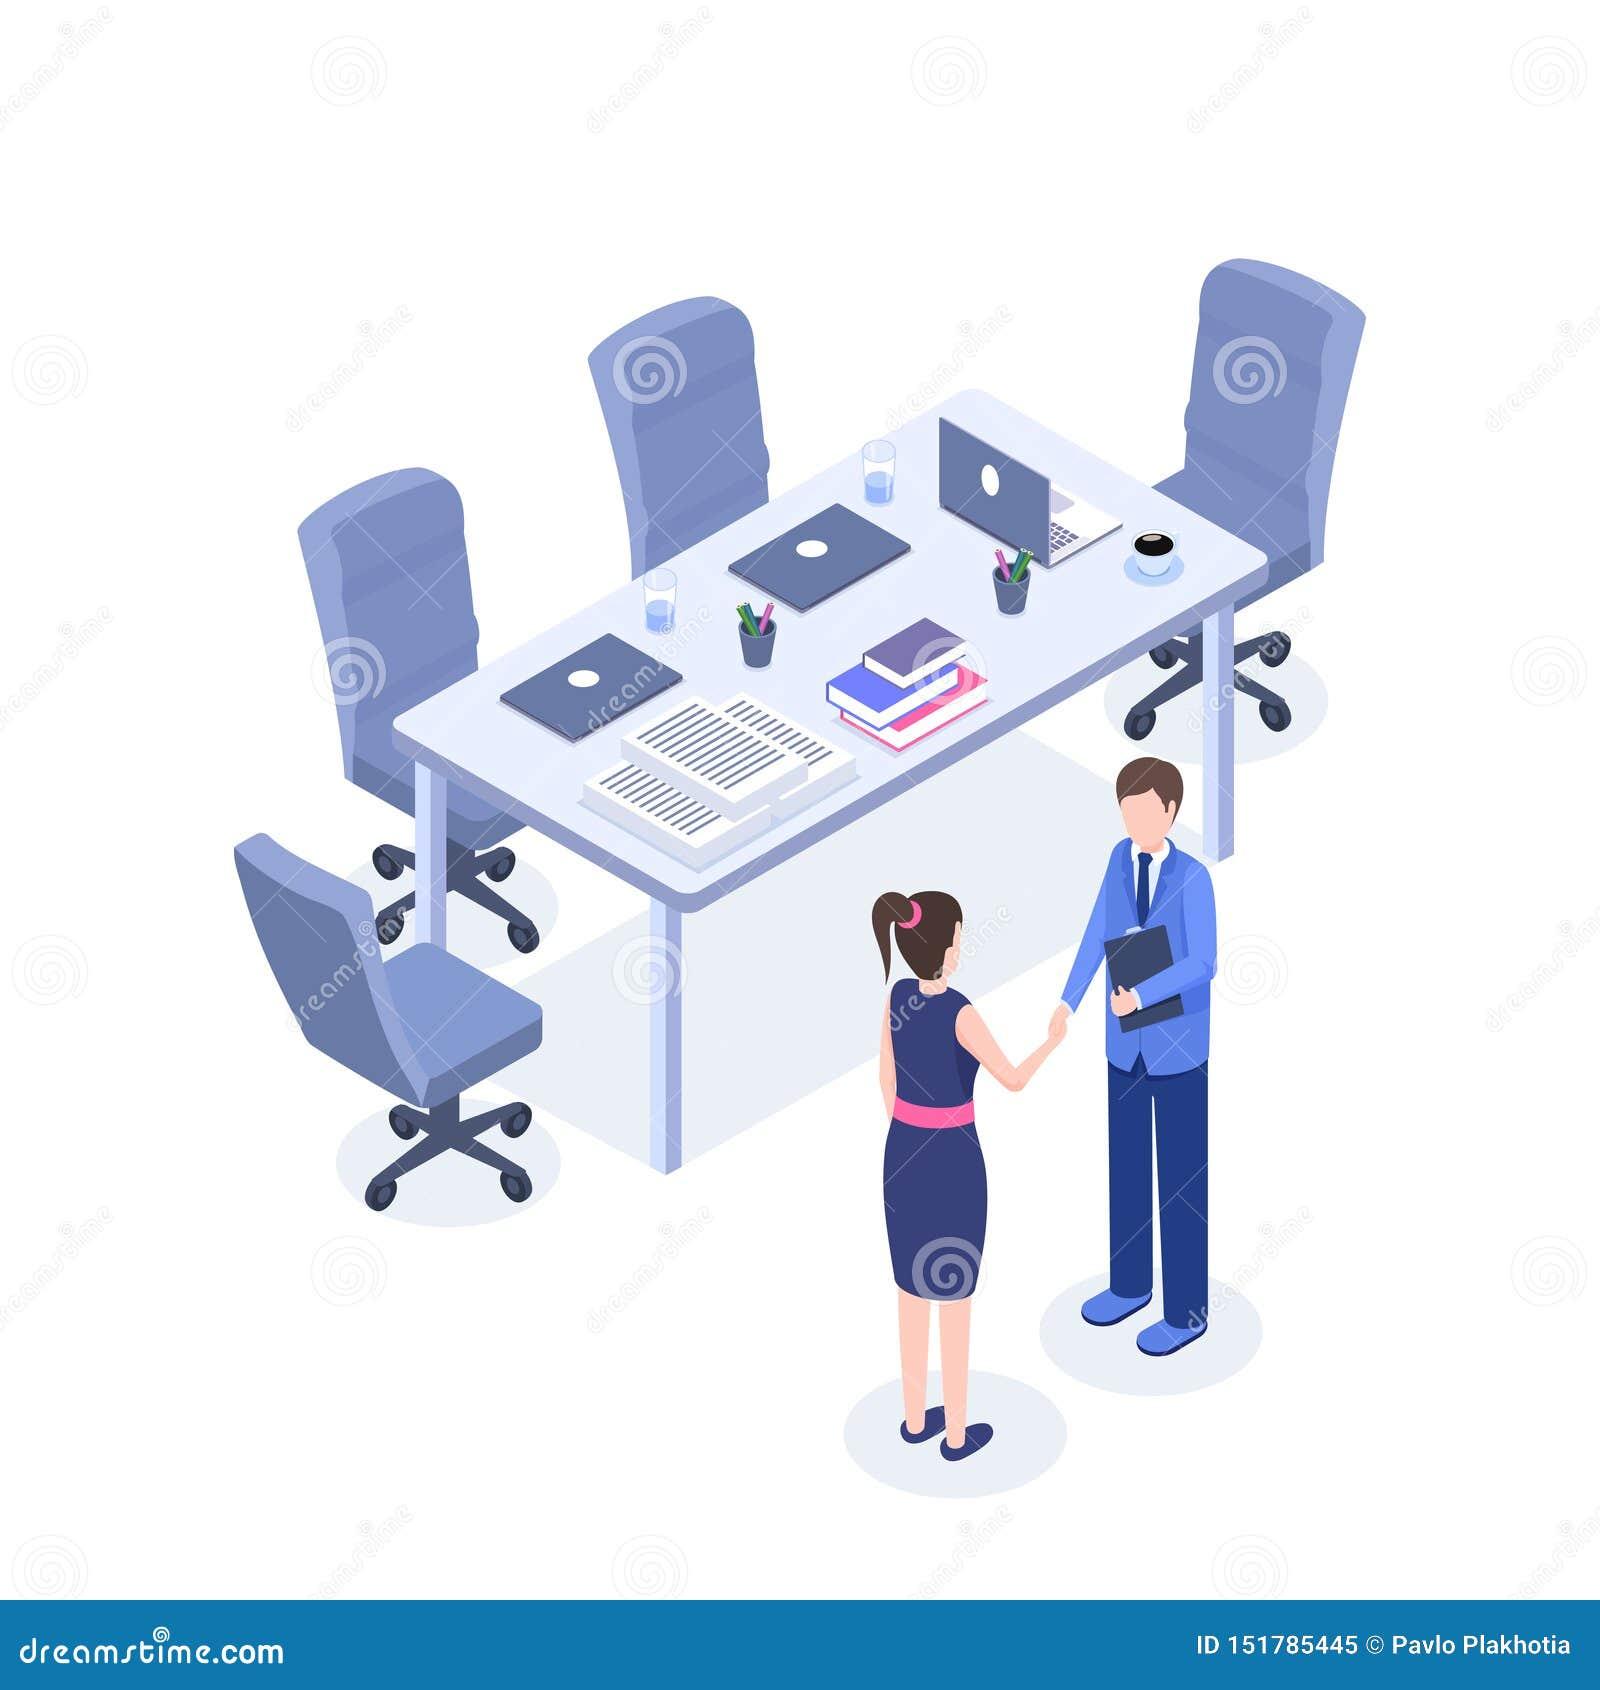 Successful Business Negotiations Isometric Illustration  HR